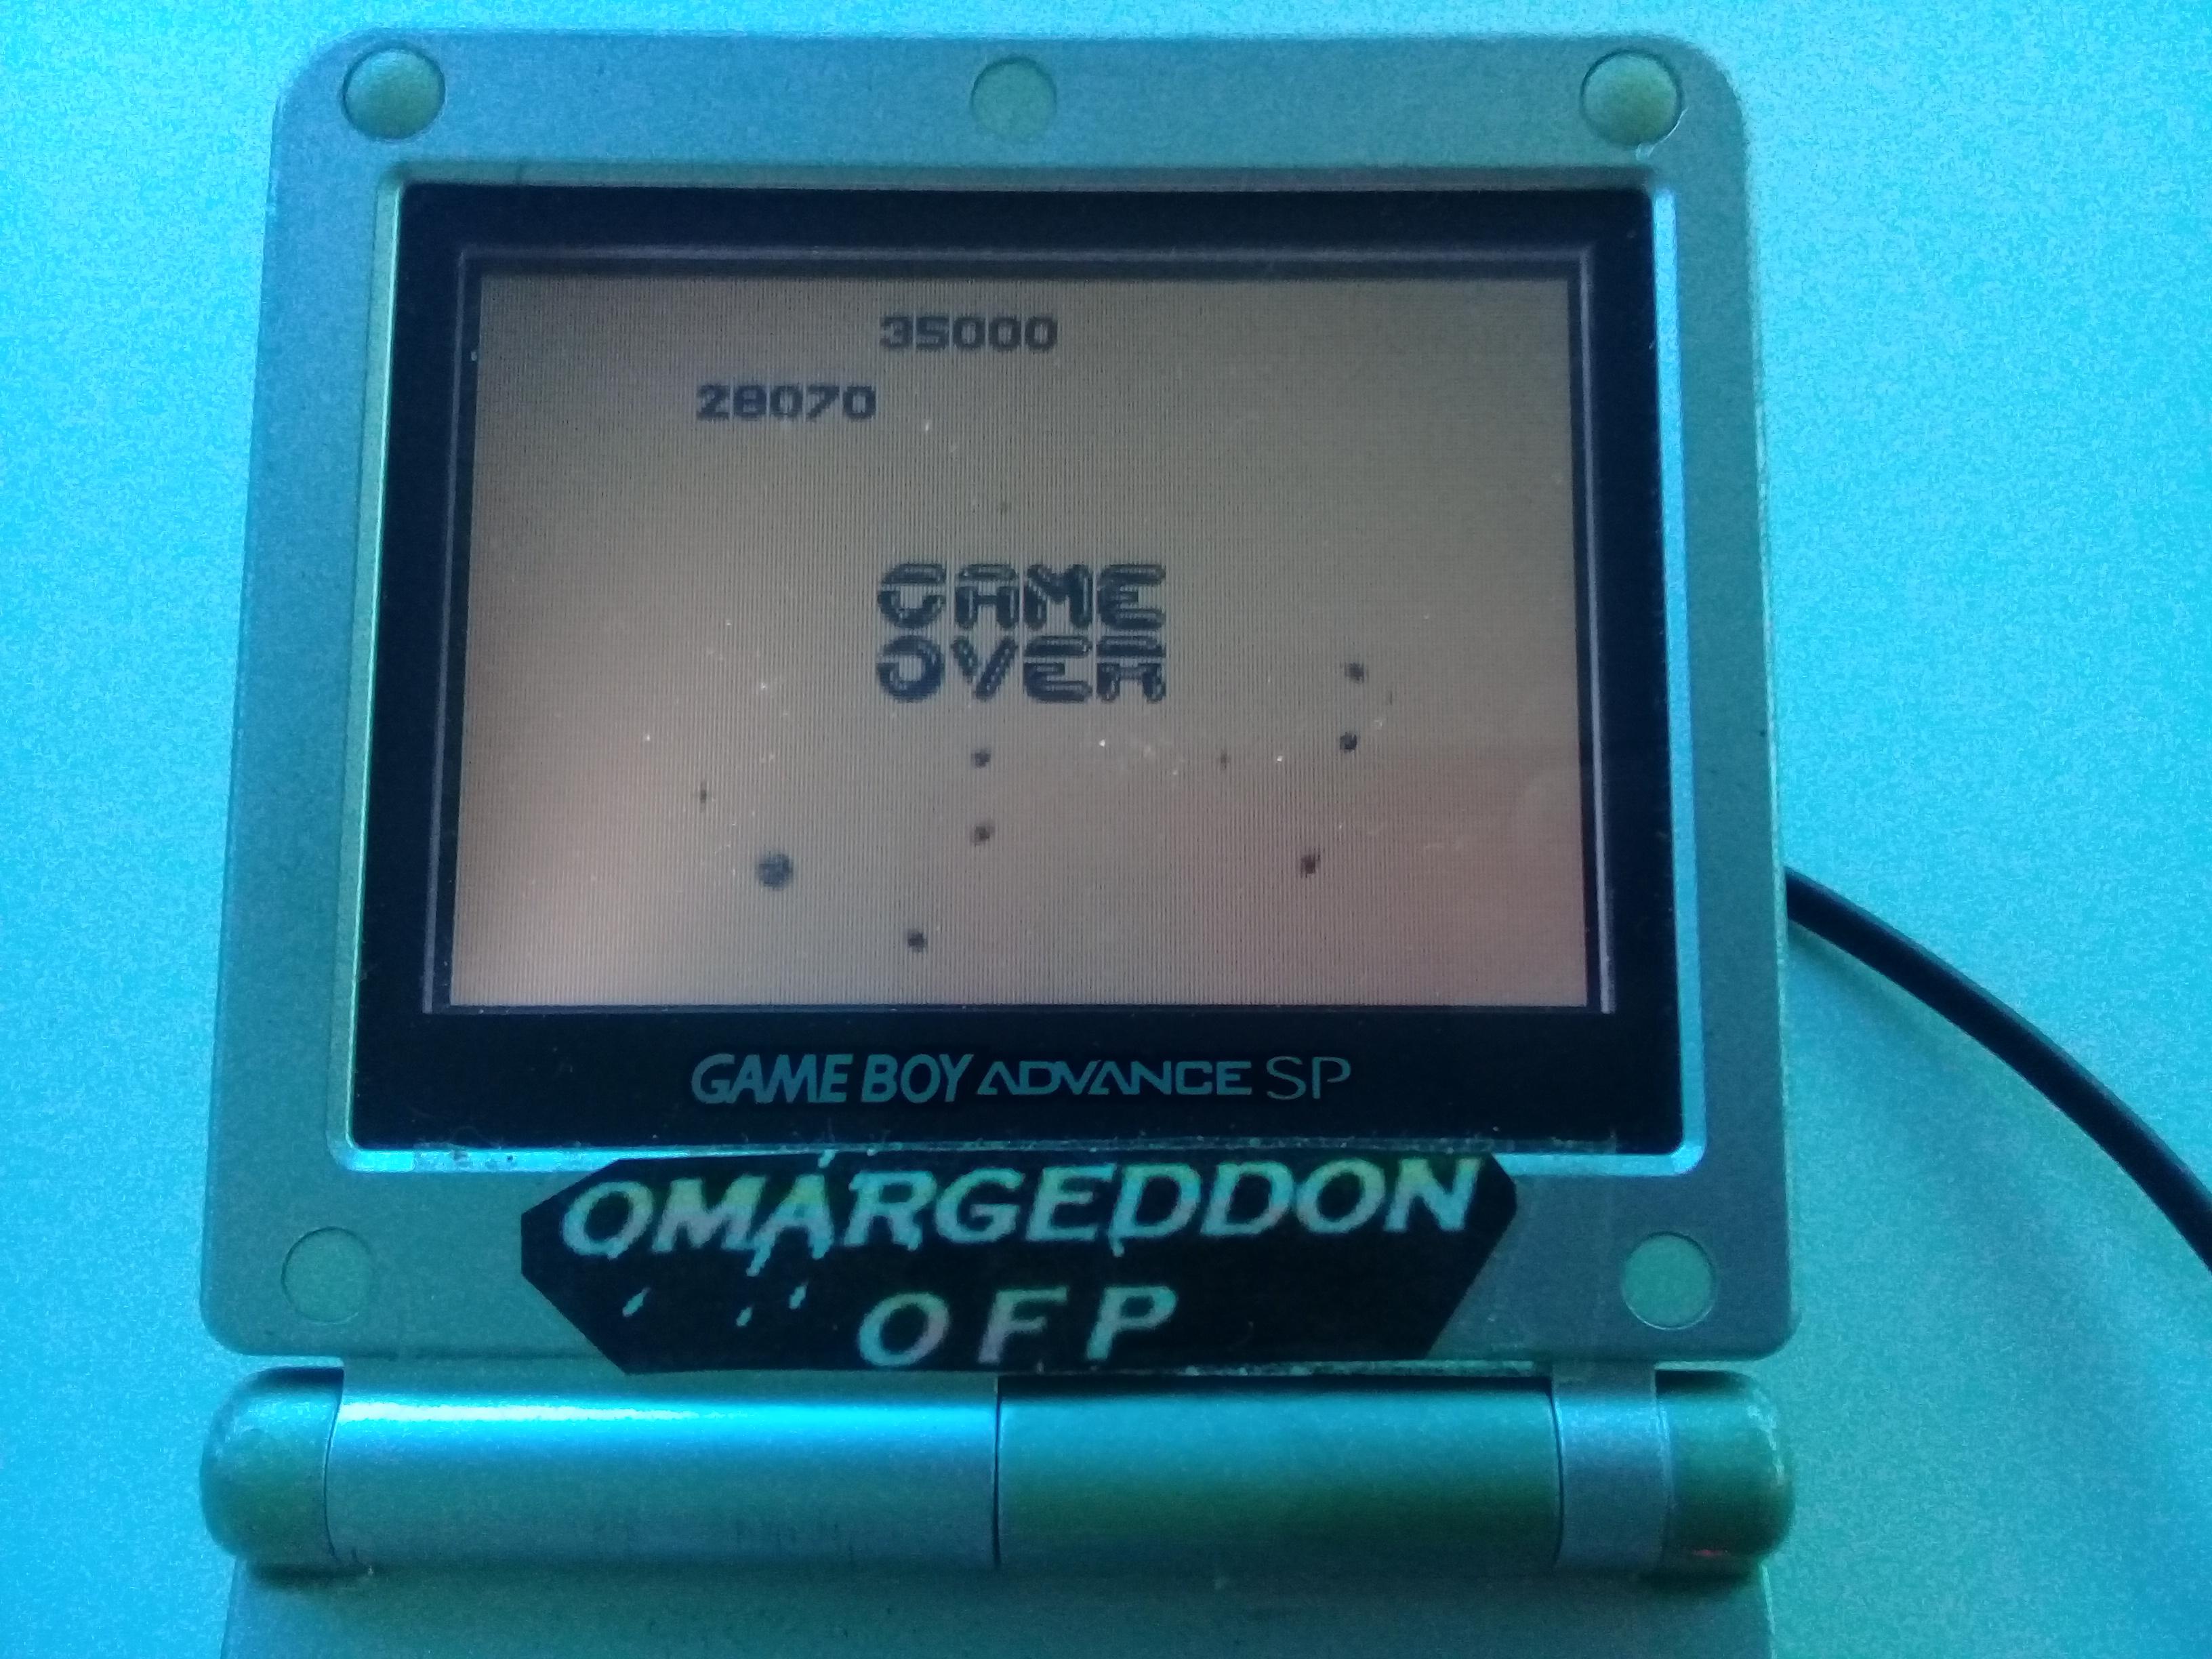 omargeddon: Asteroids (Game Boy) 28,070 points on 2019-05-19 15:06:48